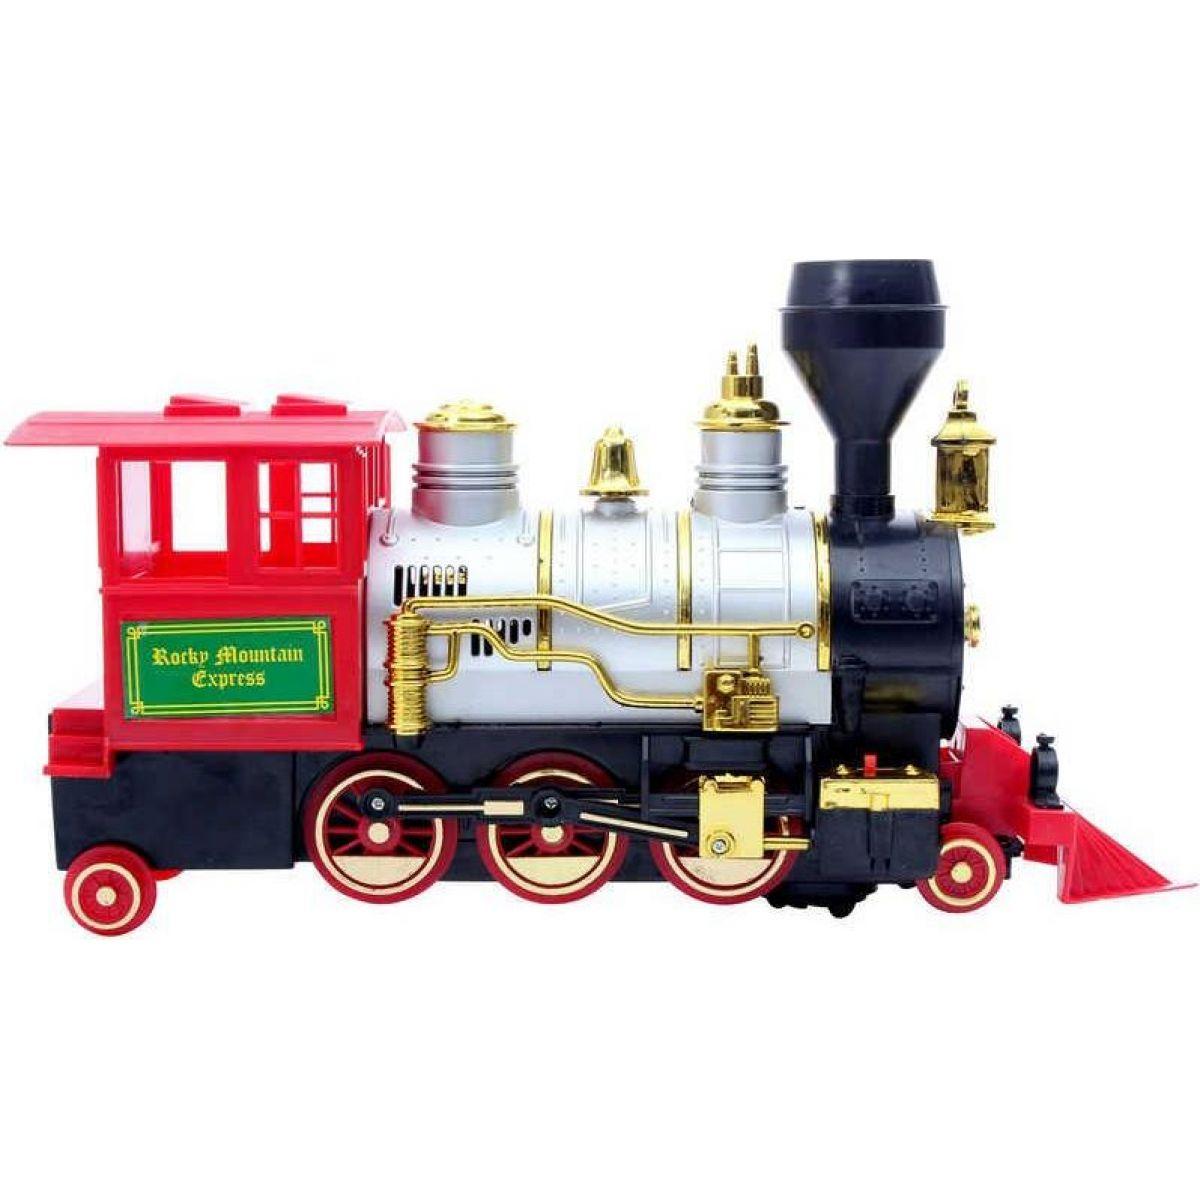 Lokomotiva na baterie 22 cm